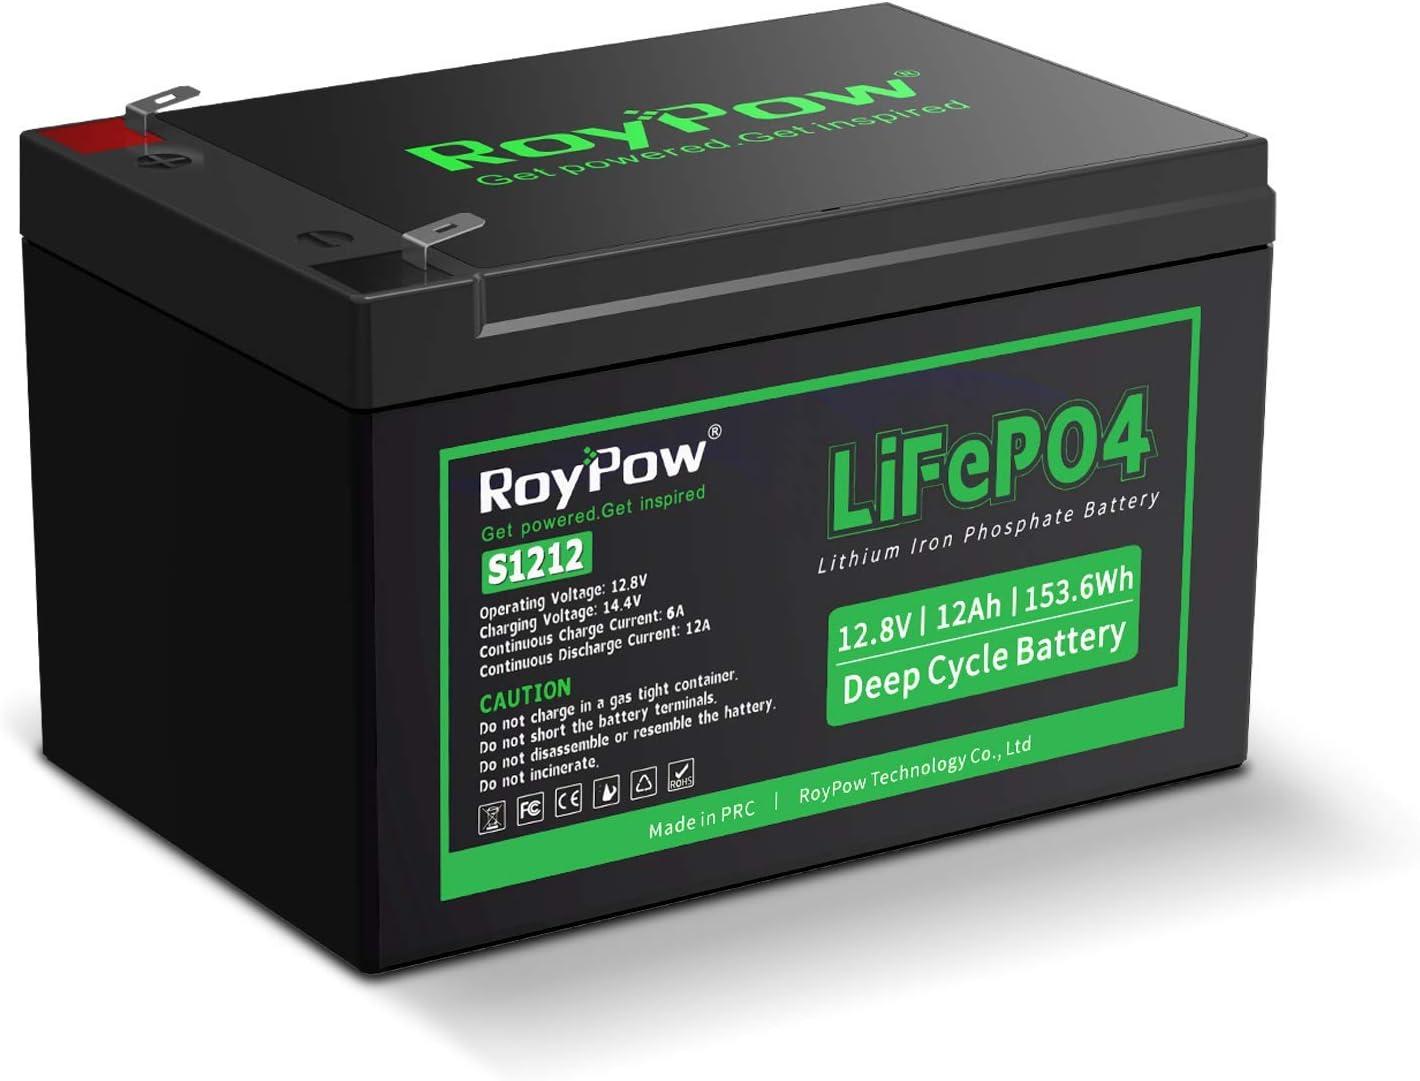 12V Lithium Battery 大特価!! 売れ筋 RoyPow Rechargeable 12Ah Ir LiFePO4